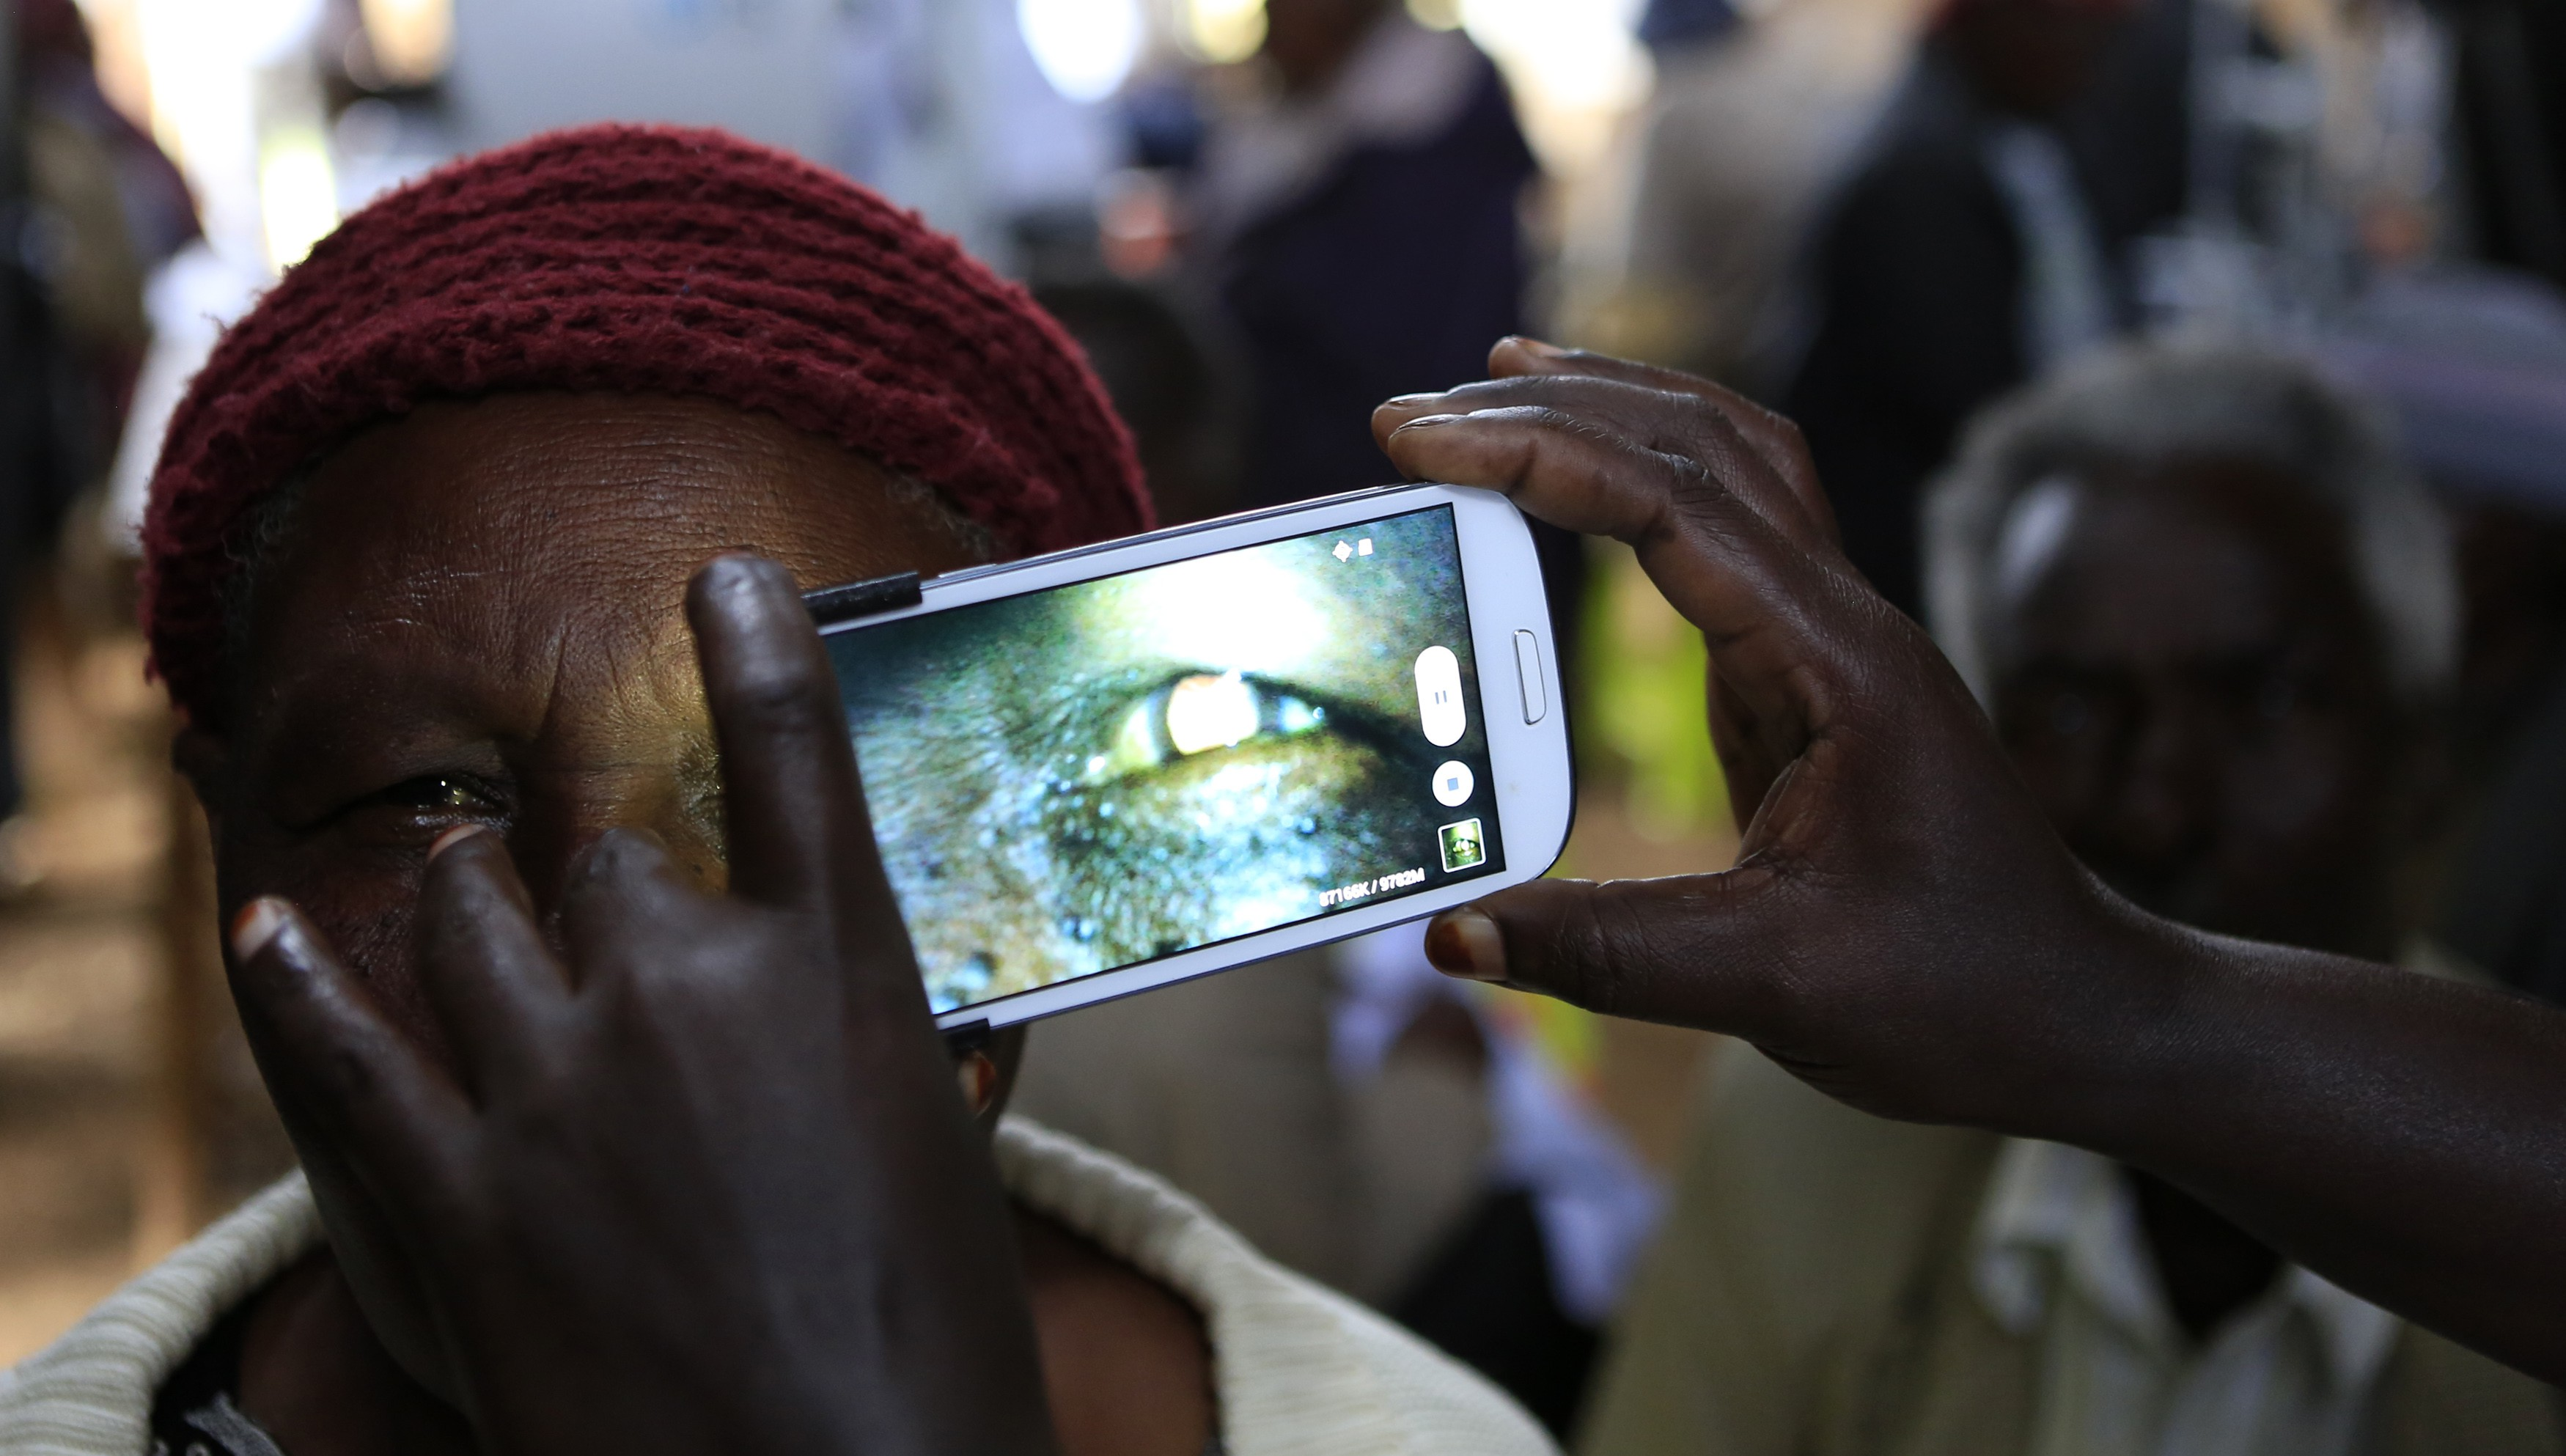 A woman undergoes an eye examination using a smartphone in Kenya. REUTERS/Noor Khamis